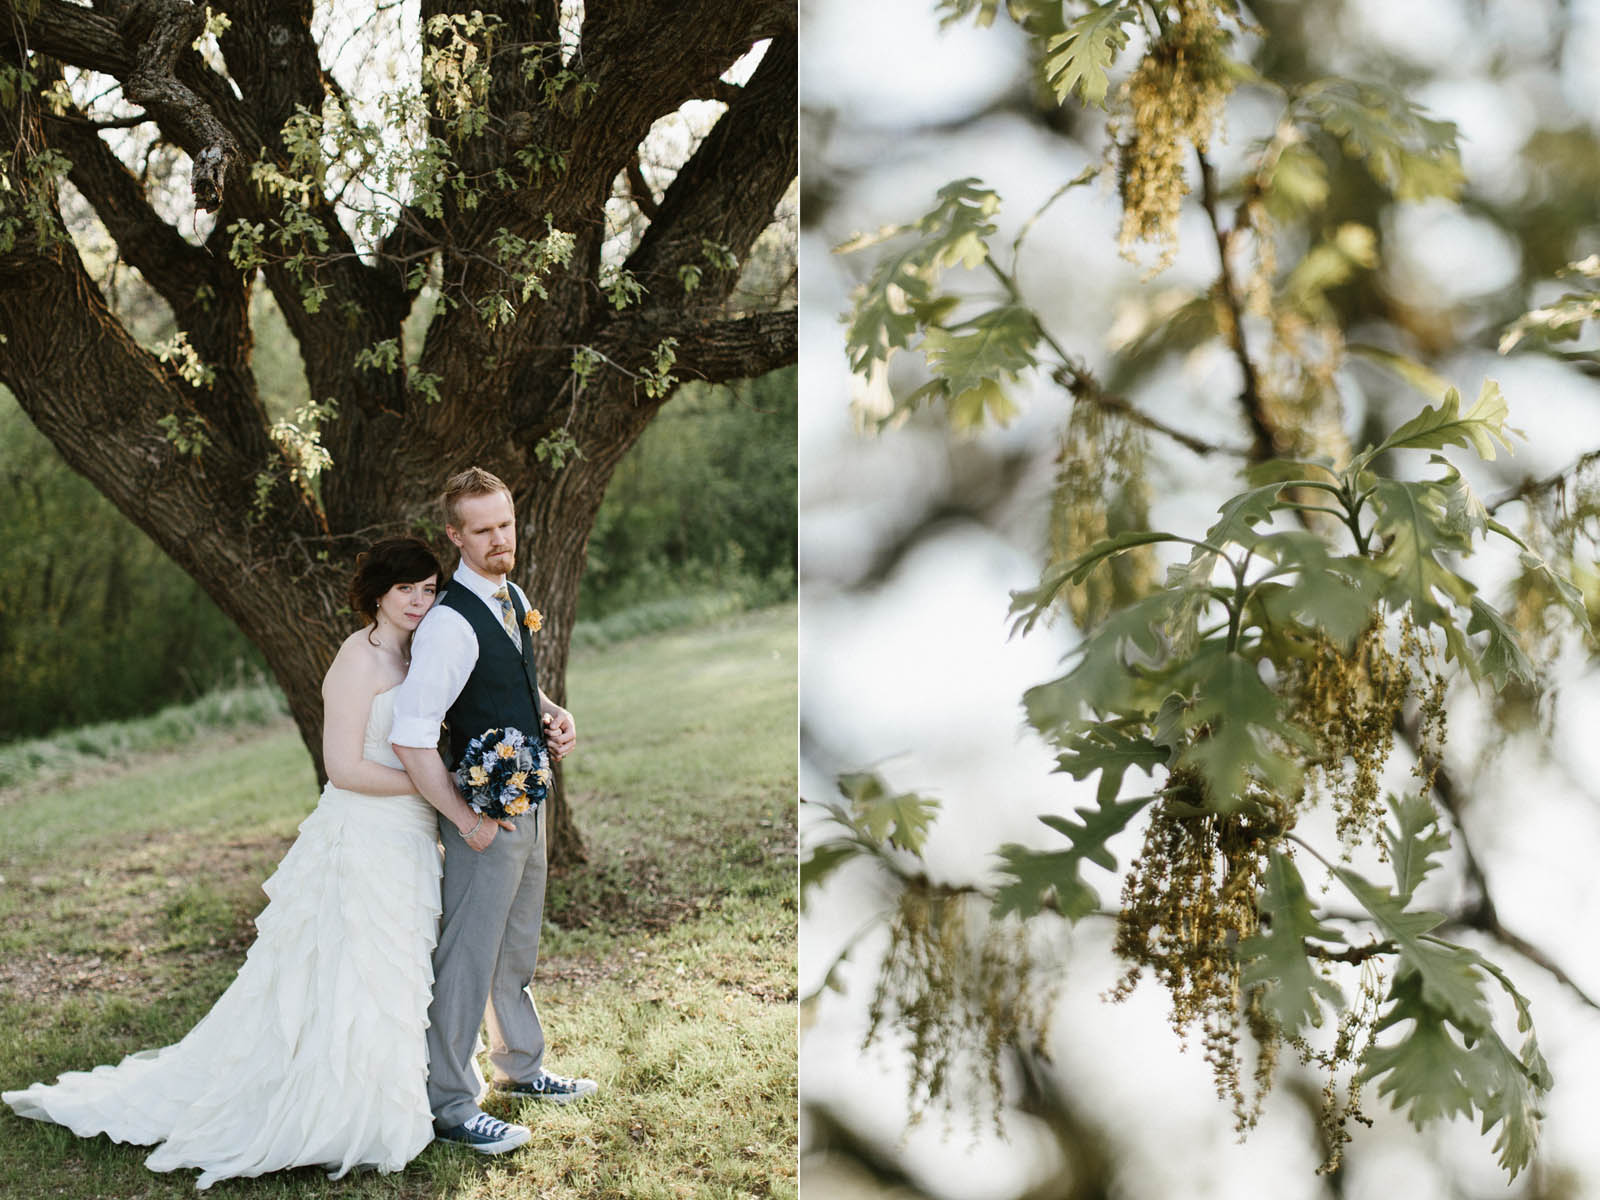 DesMoines_Wedding_Photographer_Spencer&Amanda_106.jpg